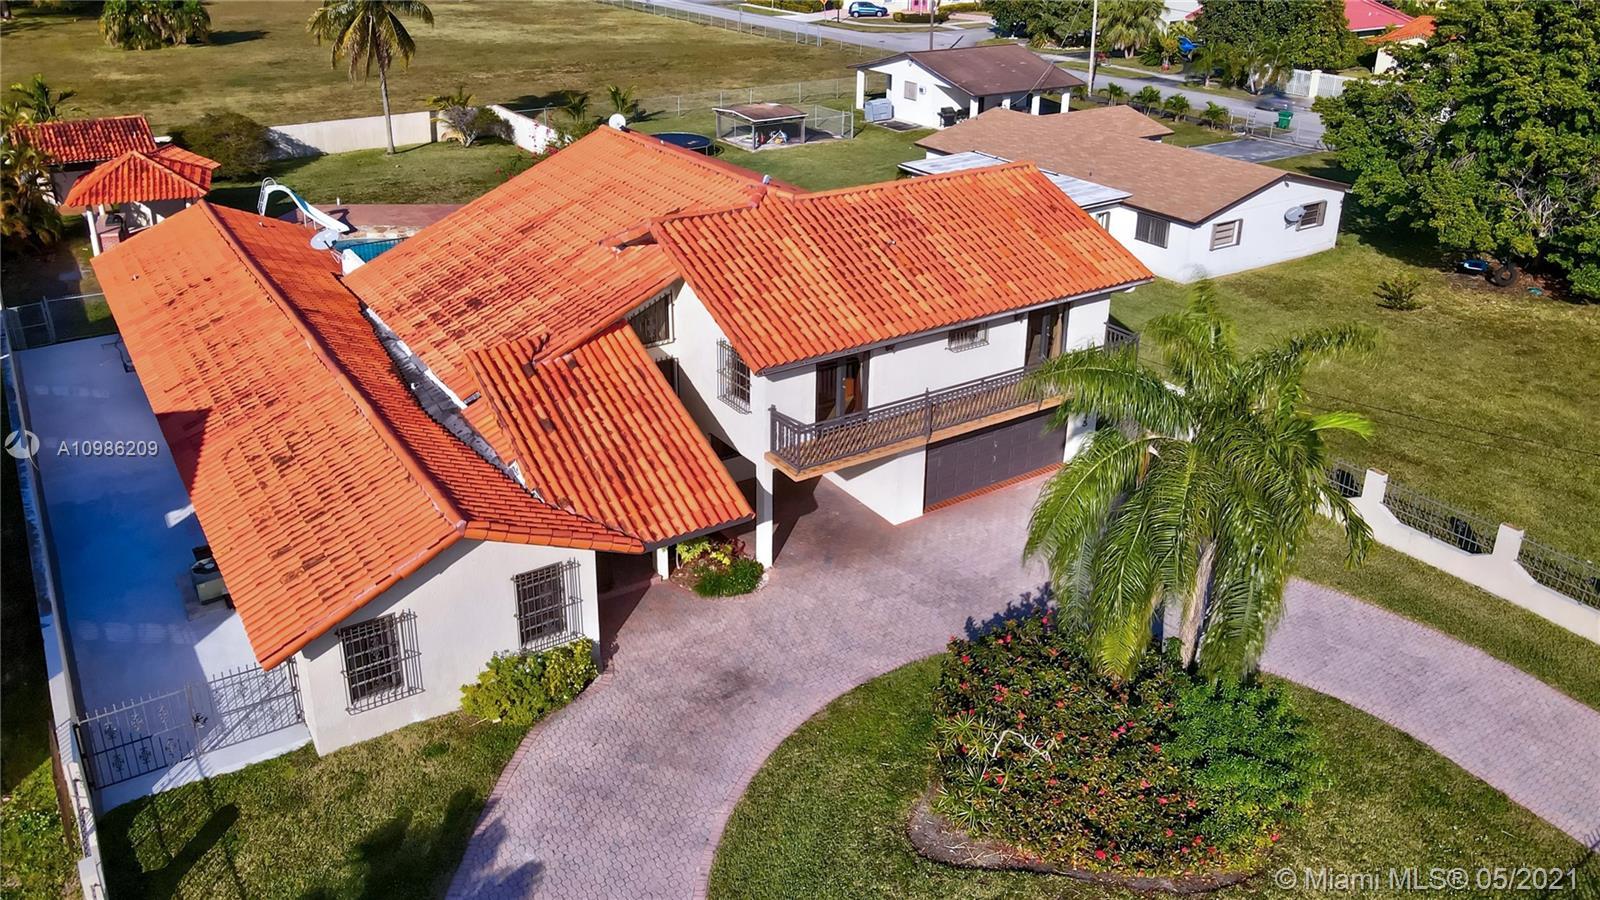 Miami Mansion